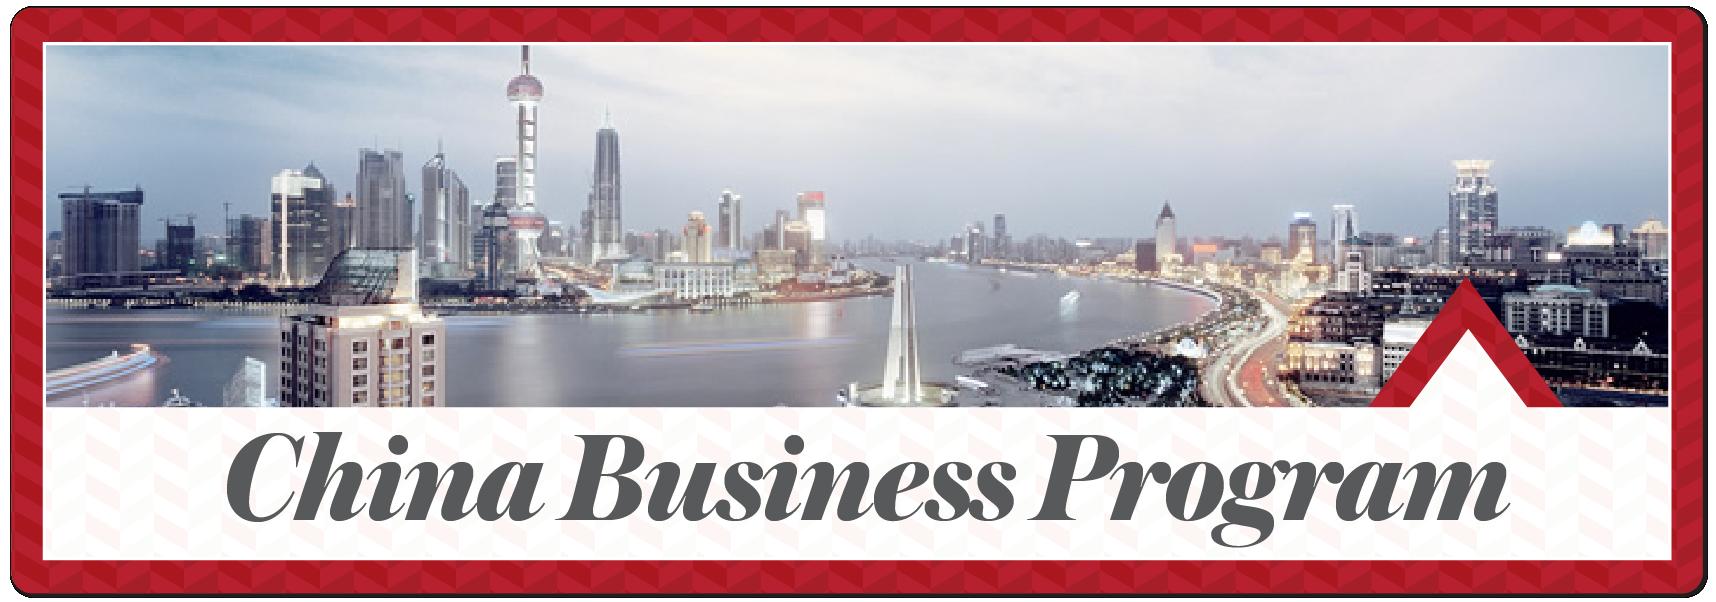 China Business Program. Photo of Shanghai skyline